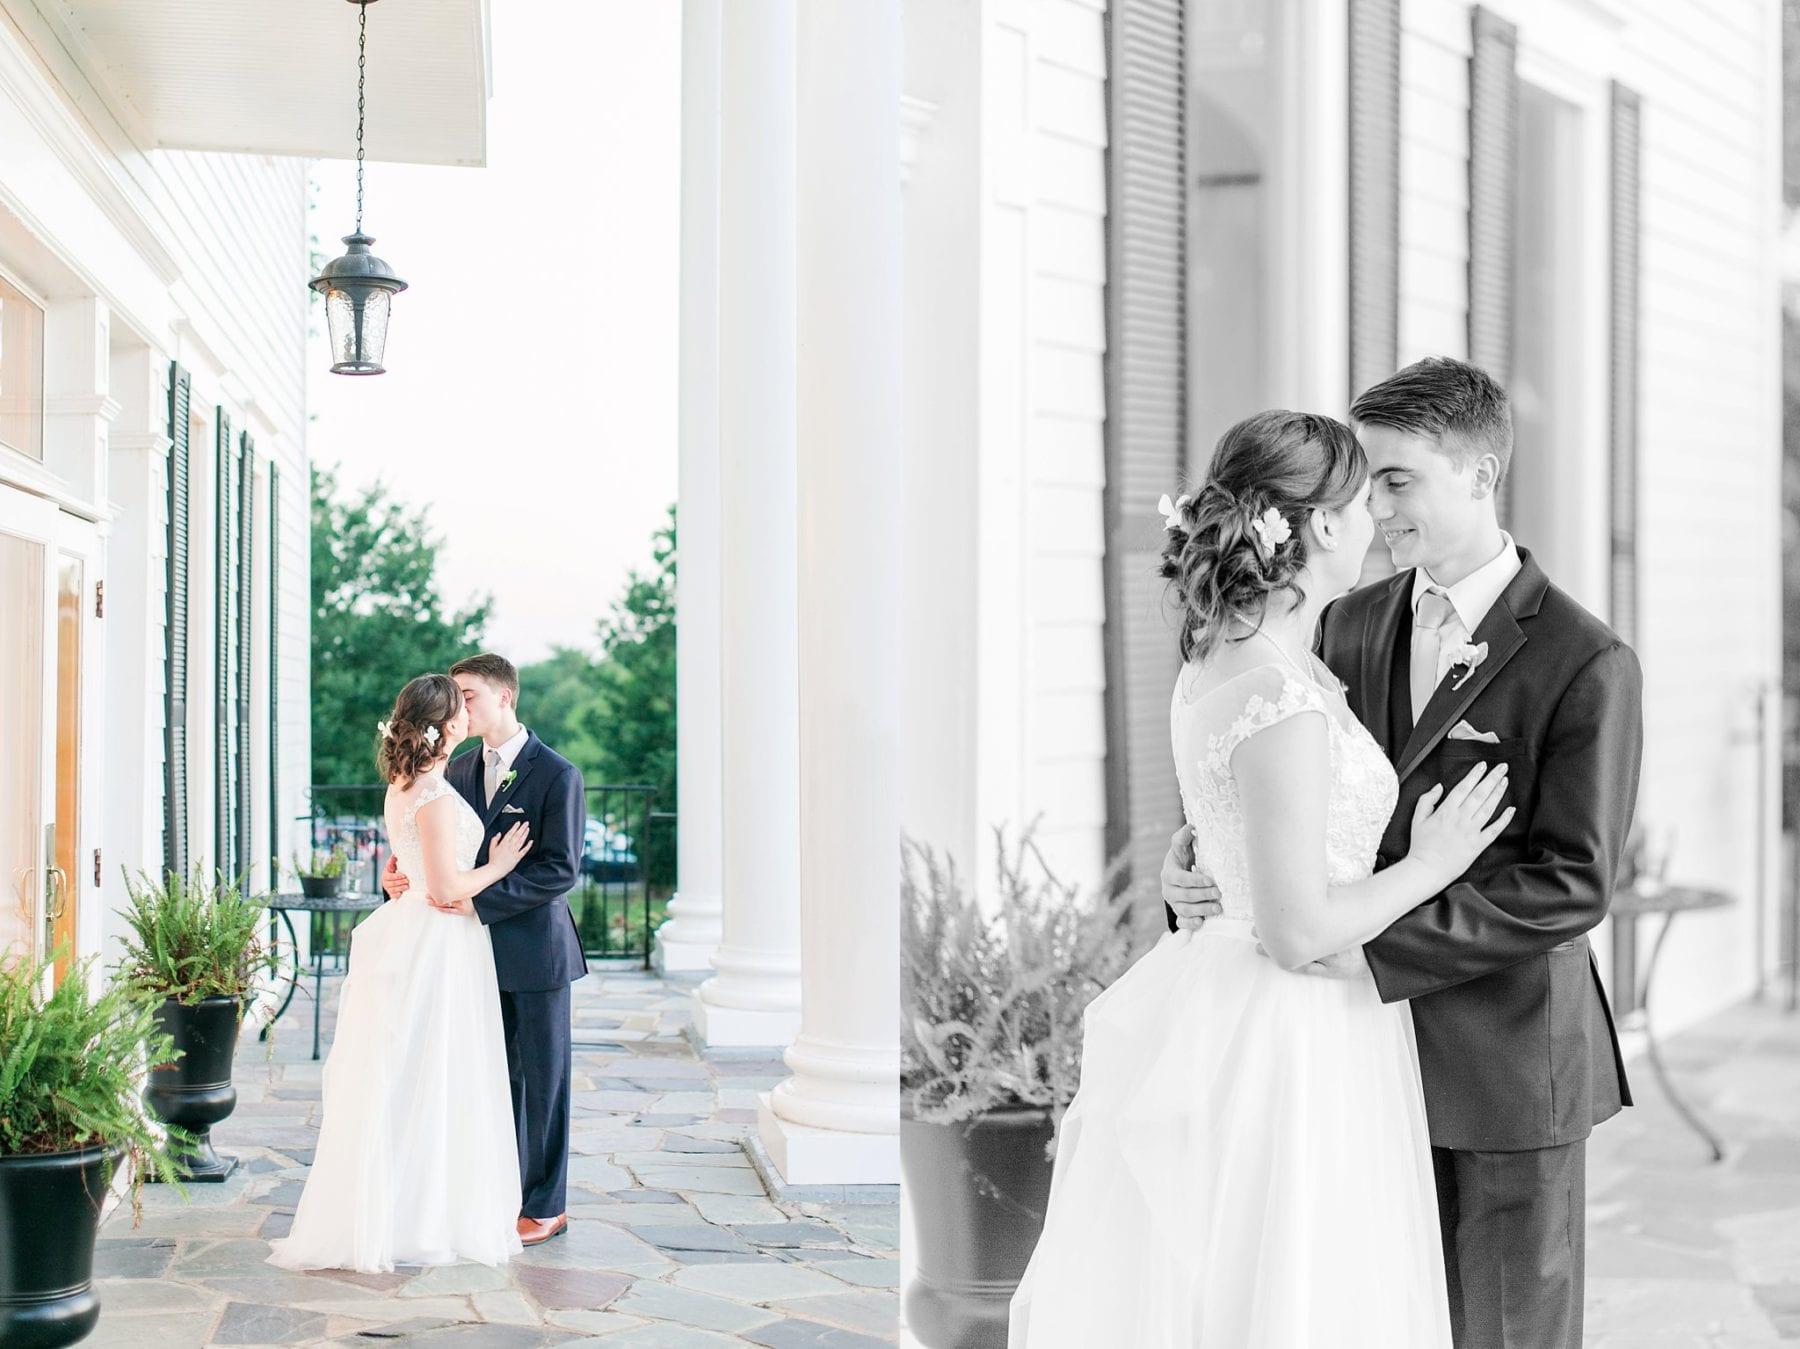 Bristow Manor Wedding Photos Virginia Wedding Photographer Lauren & Andrew Megan Kelsey Photography-630.jpg